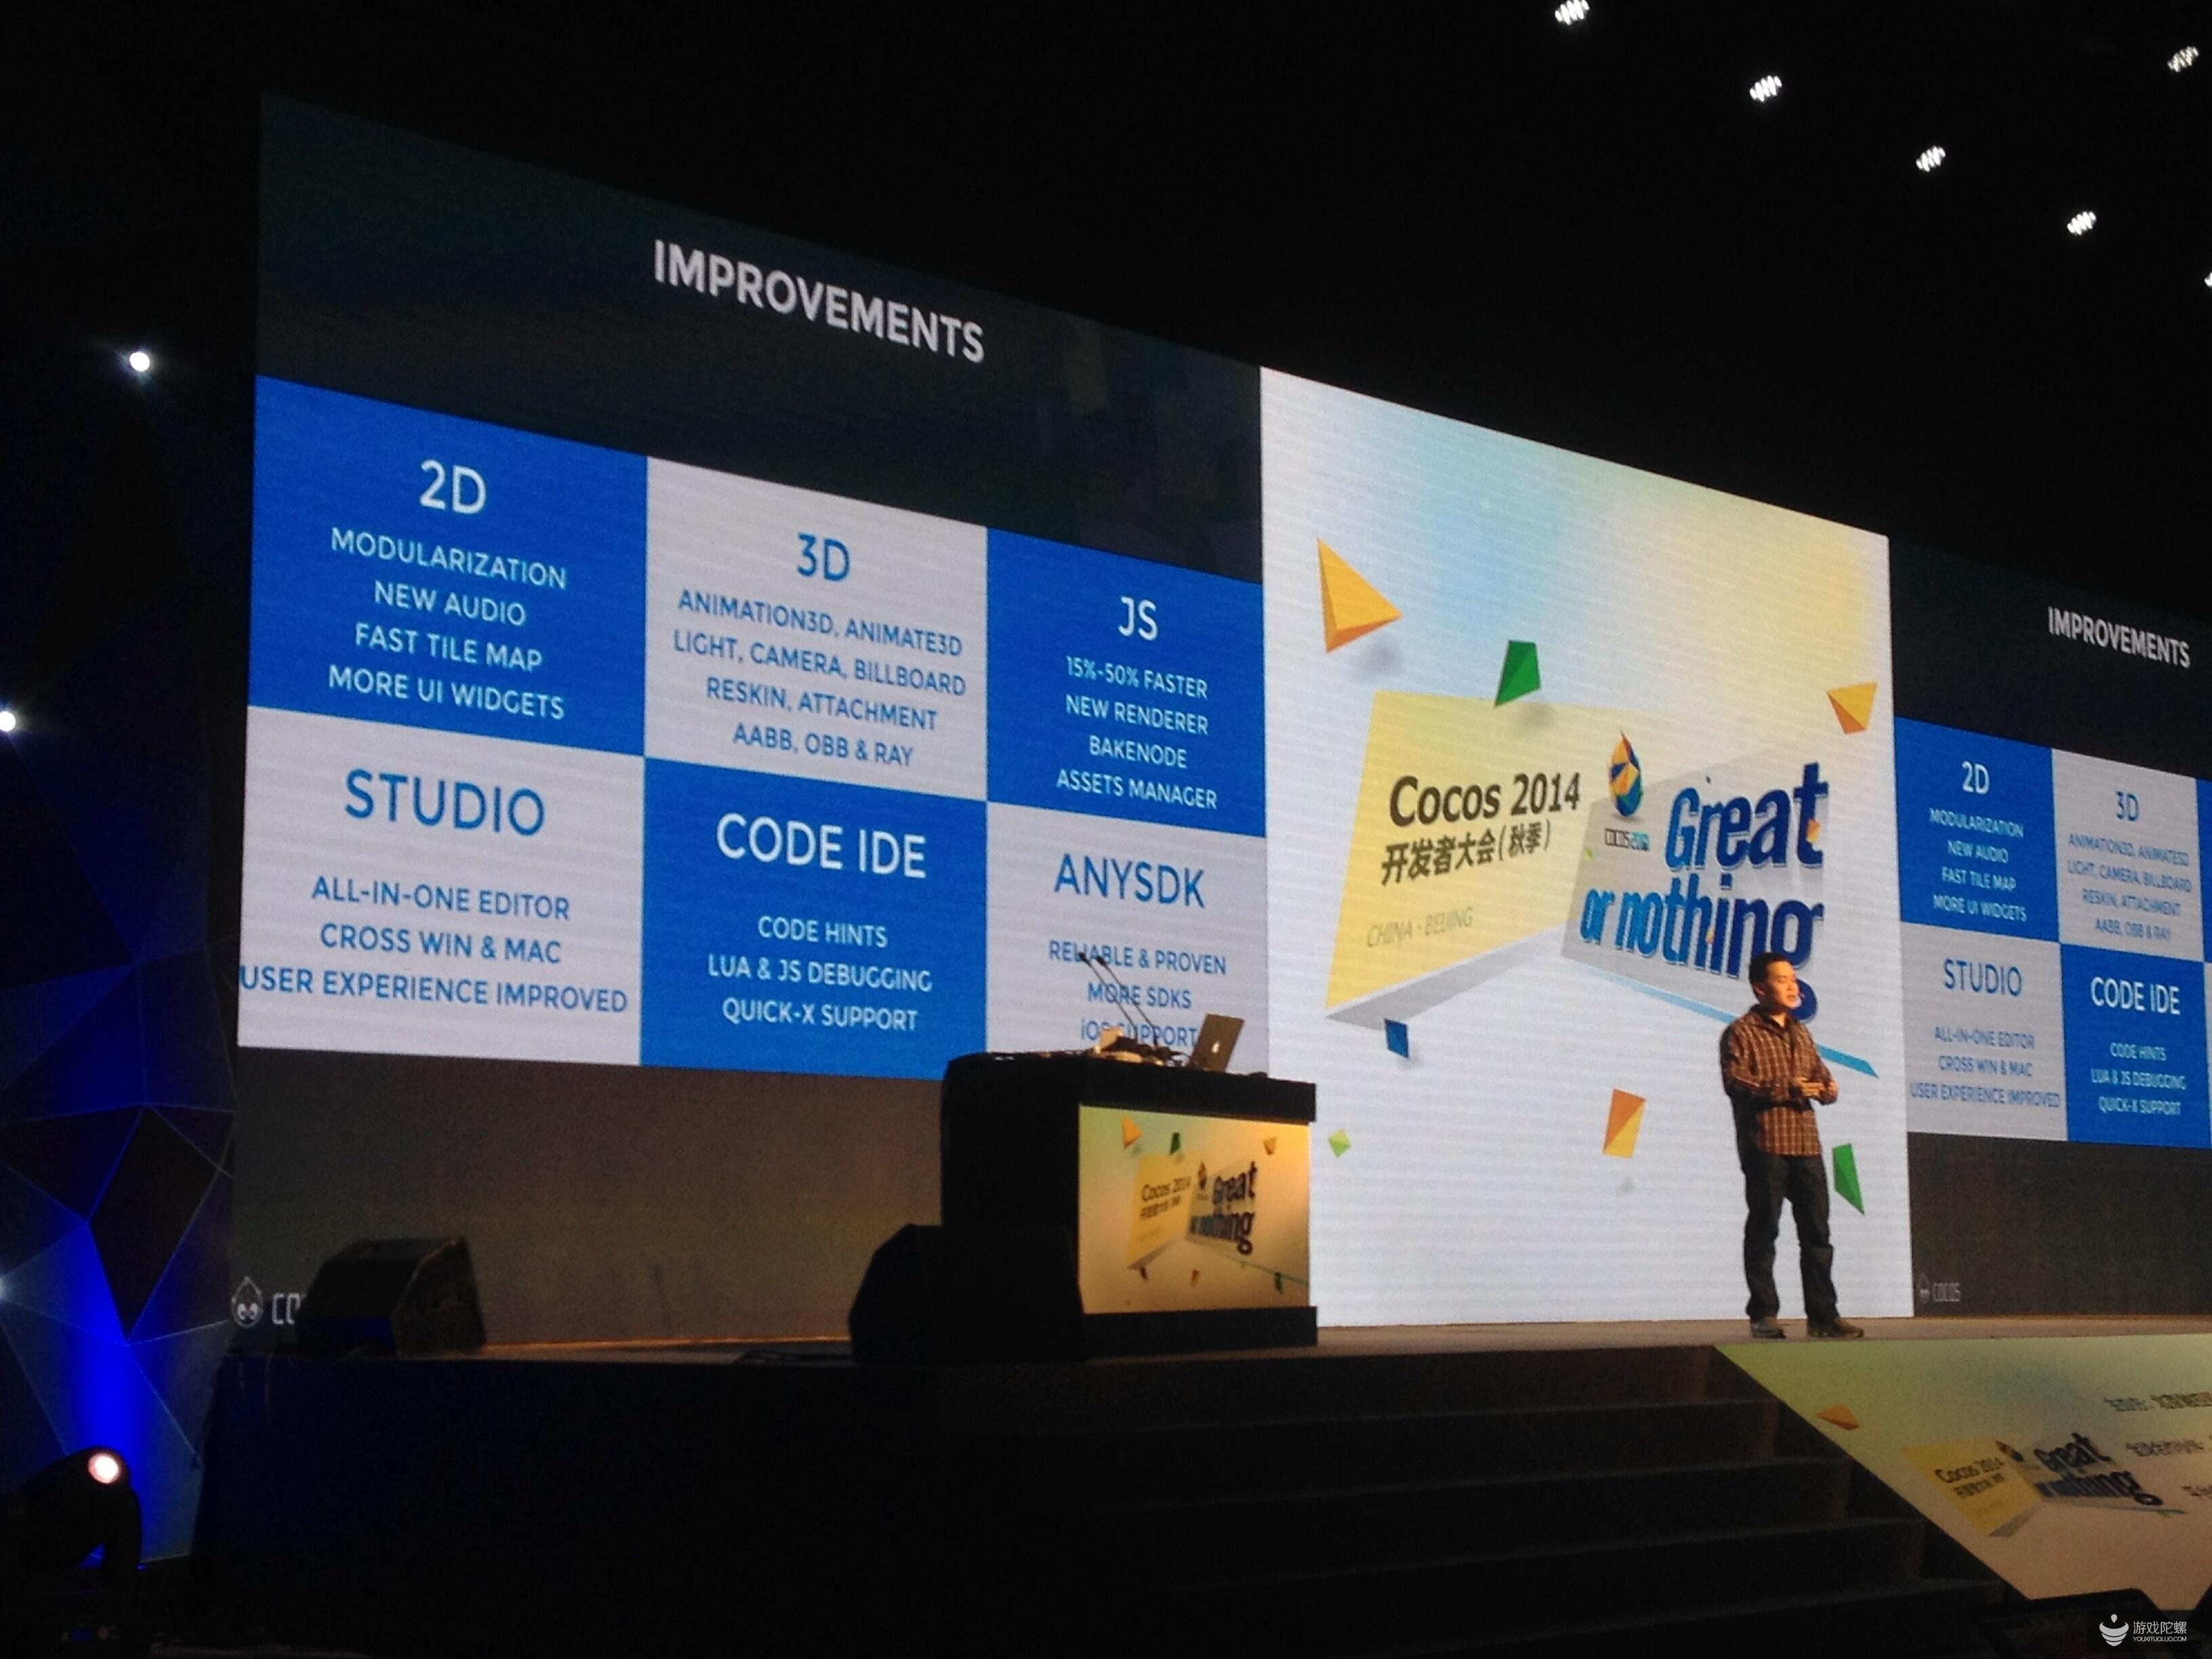 Cocos开发者大会王哲:重新定义了Cocos 没有2D和3D的区别